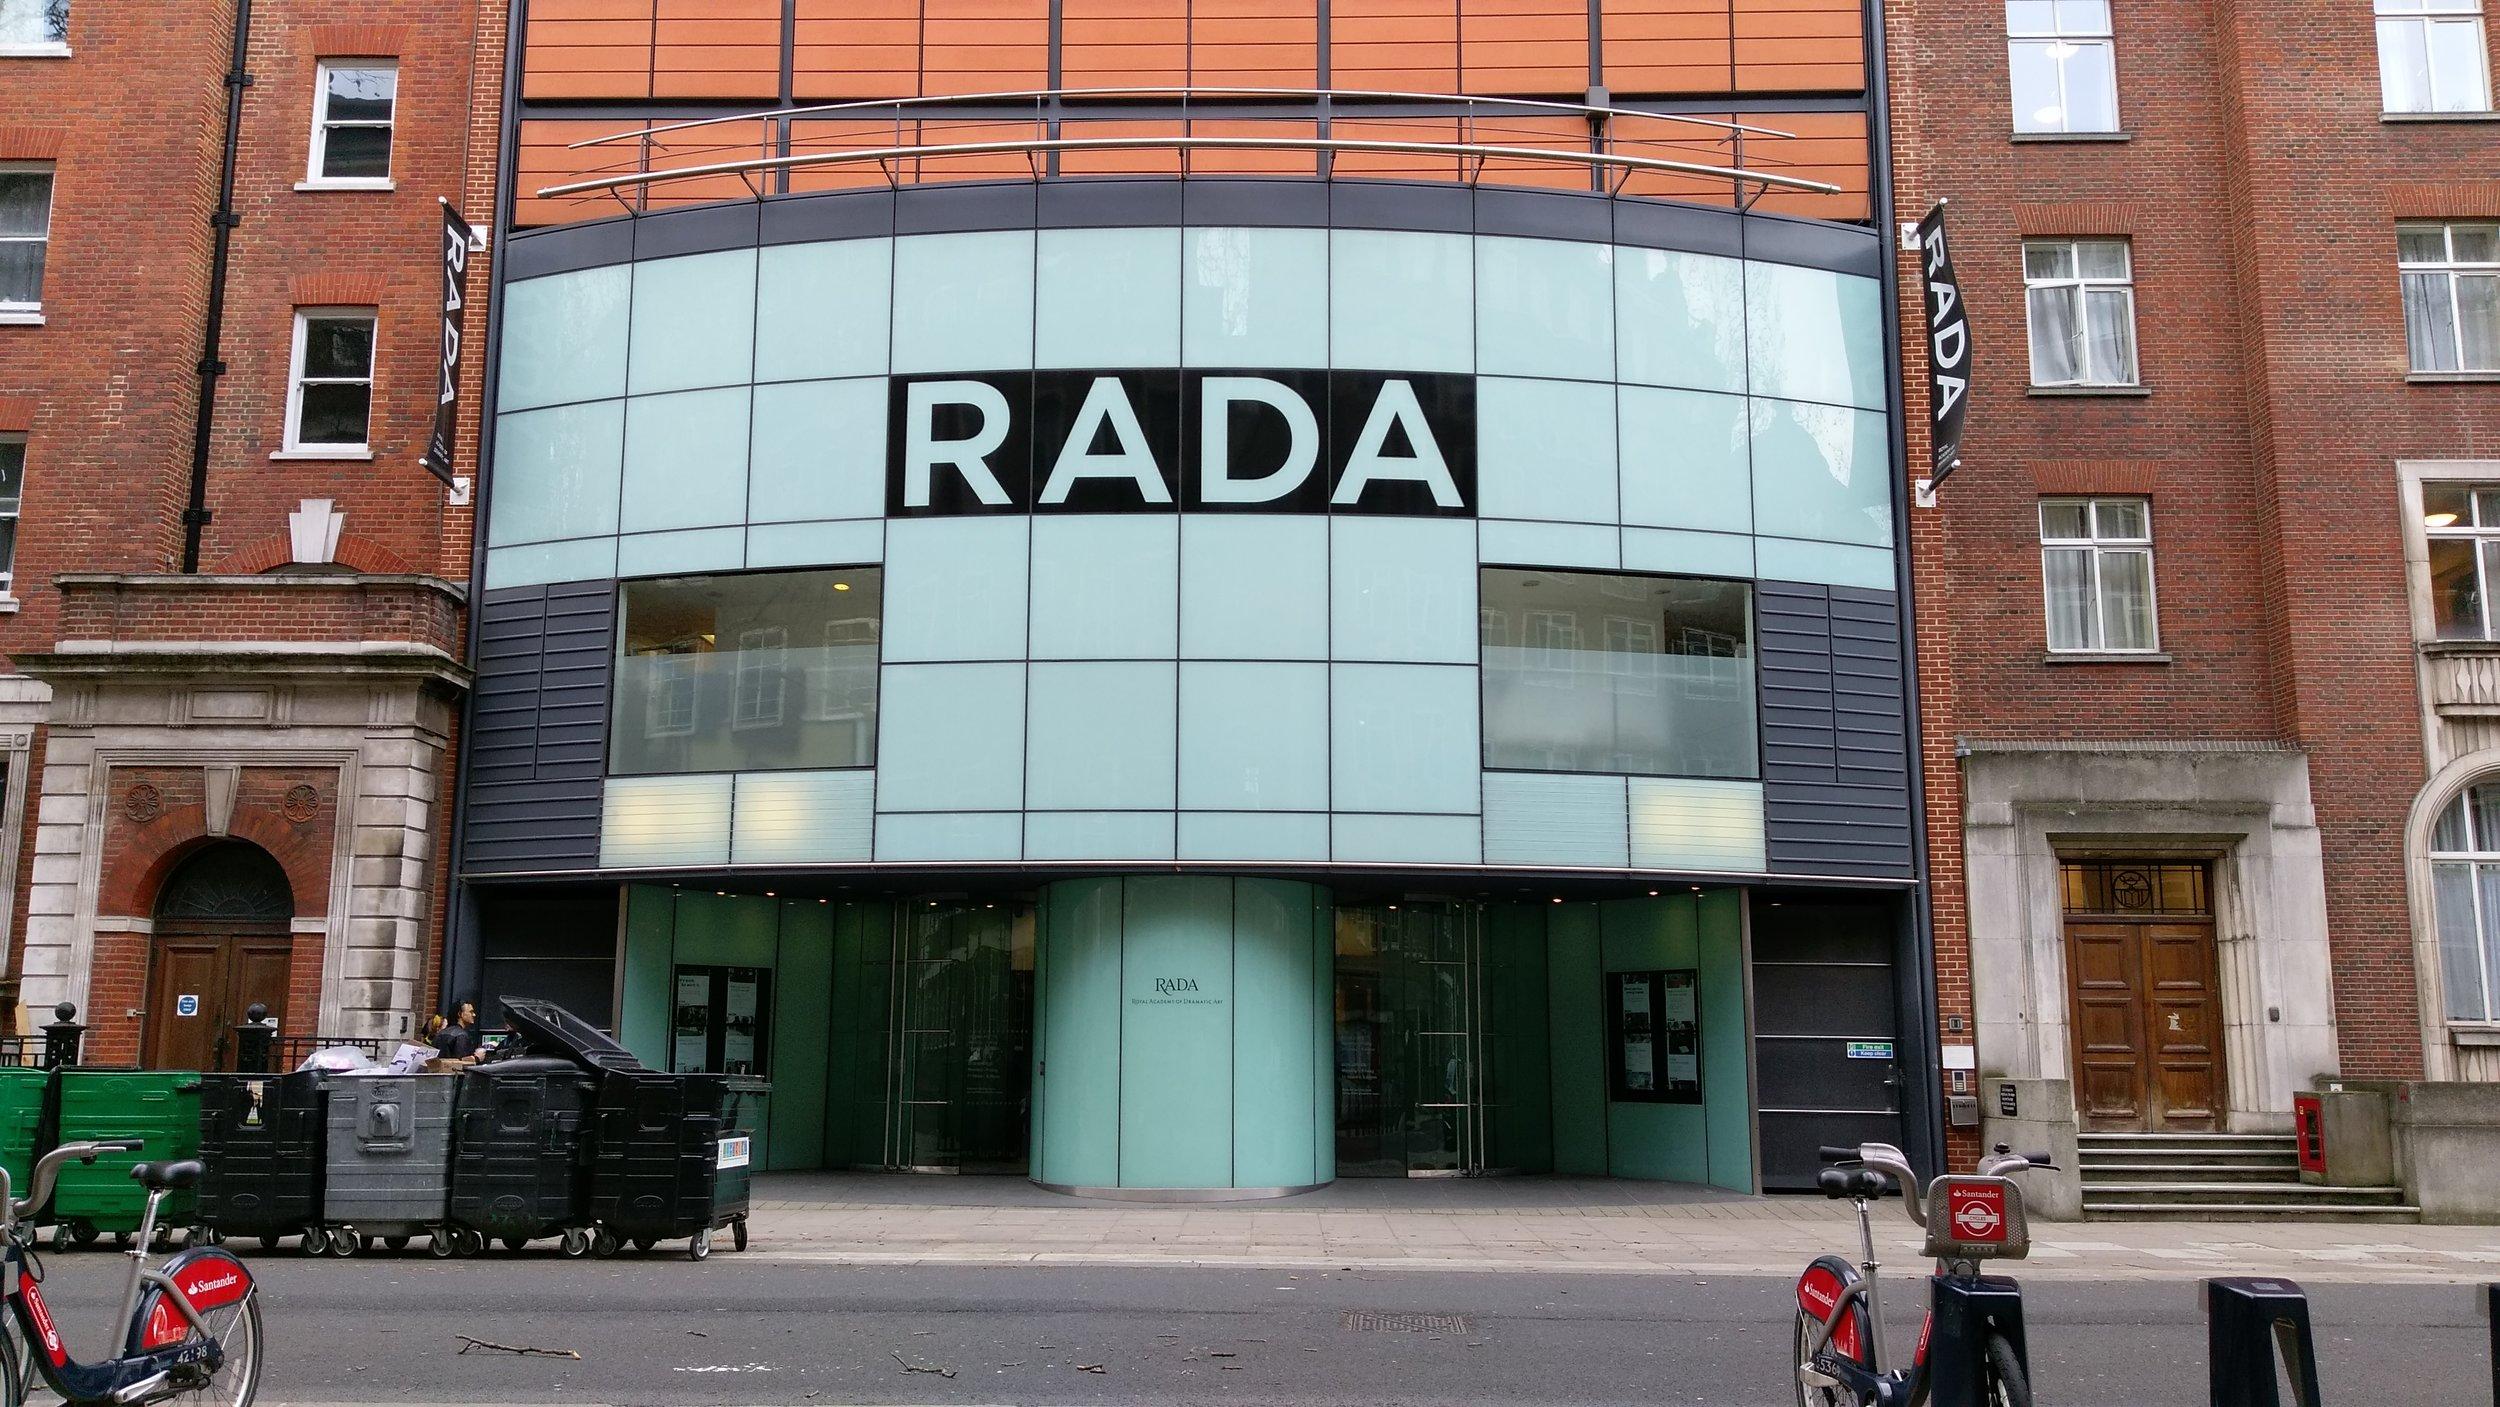 RADA(George Bernard Shaw Theatre) - visited 09/02/2019